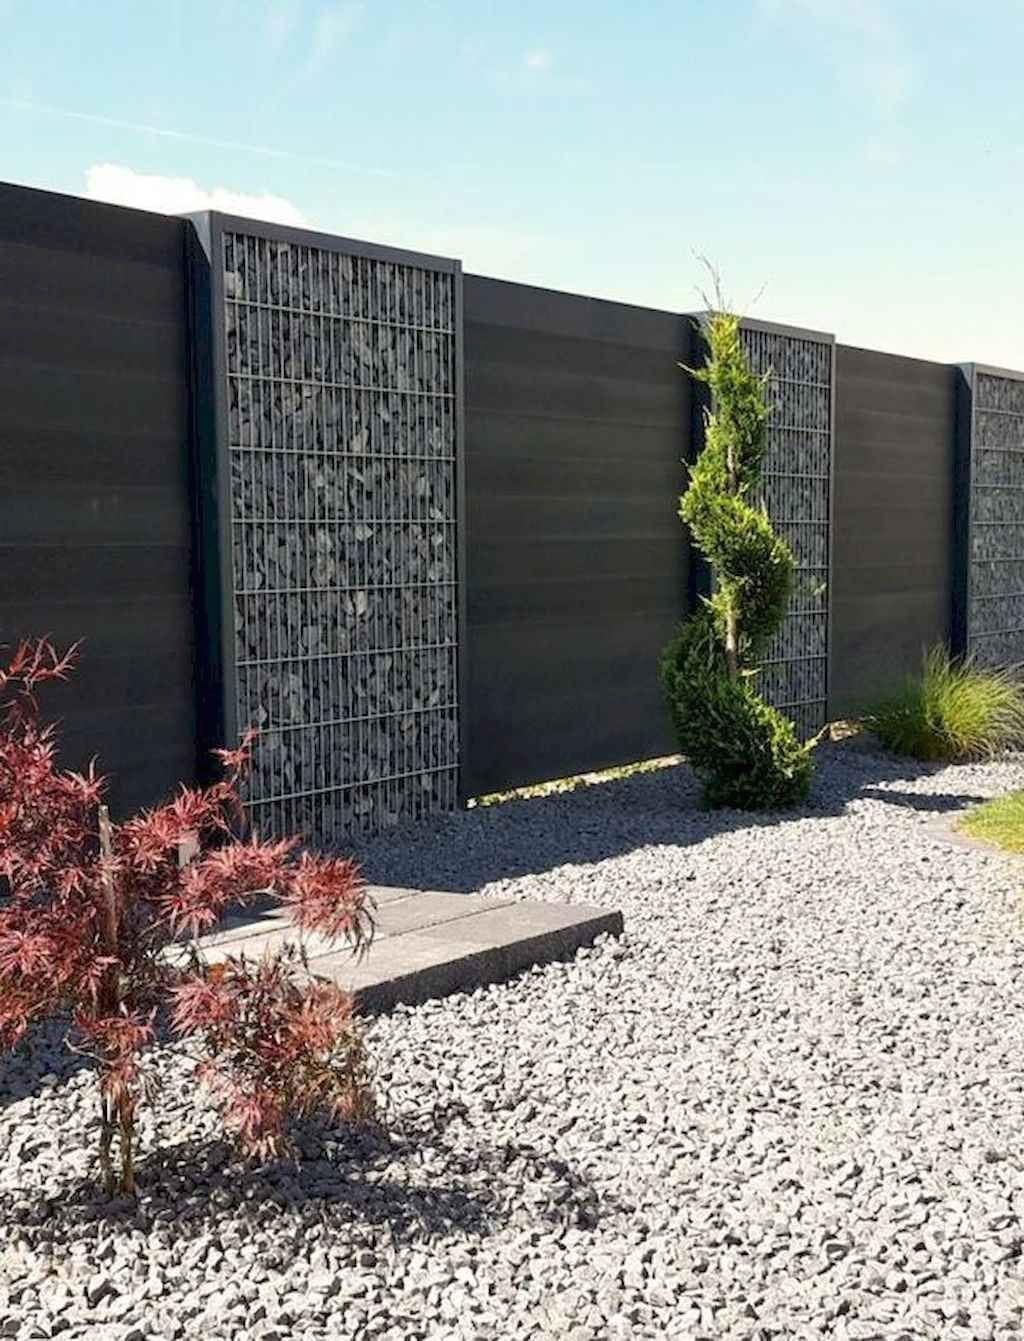 43 Gorgeous Gabion Fence Design For Garden Ideas Decoradeas Modern Modern Design 1 In 2020 Fence Design Gabion Fence Privacy Fence Designs